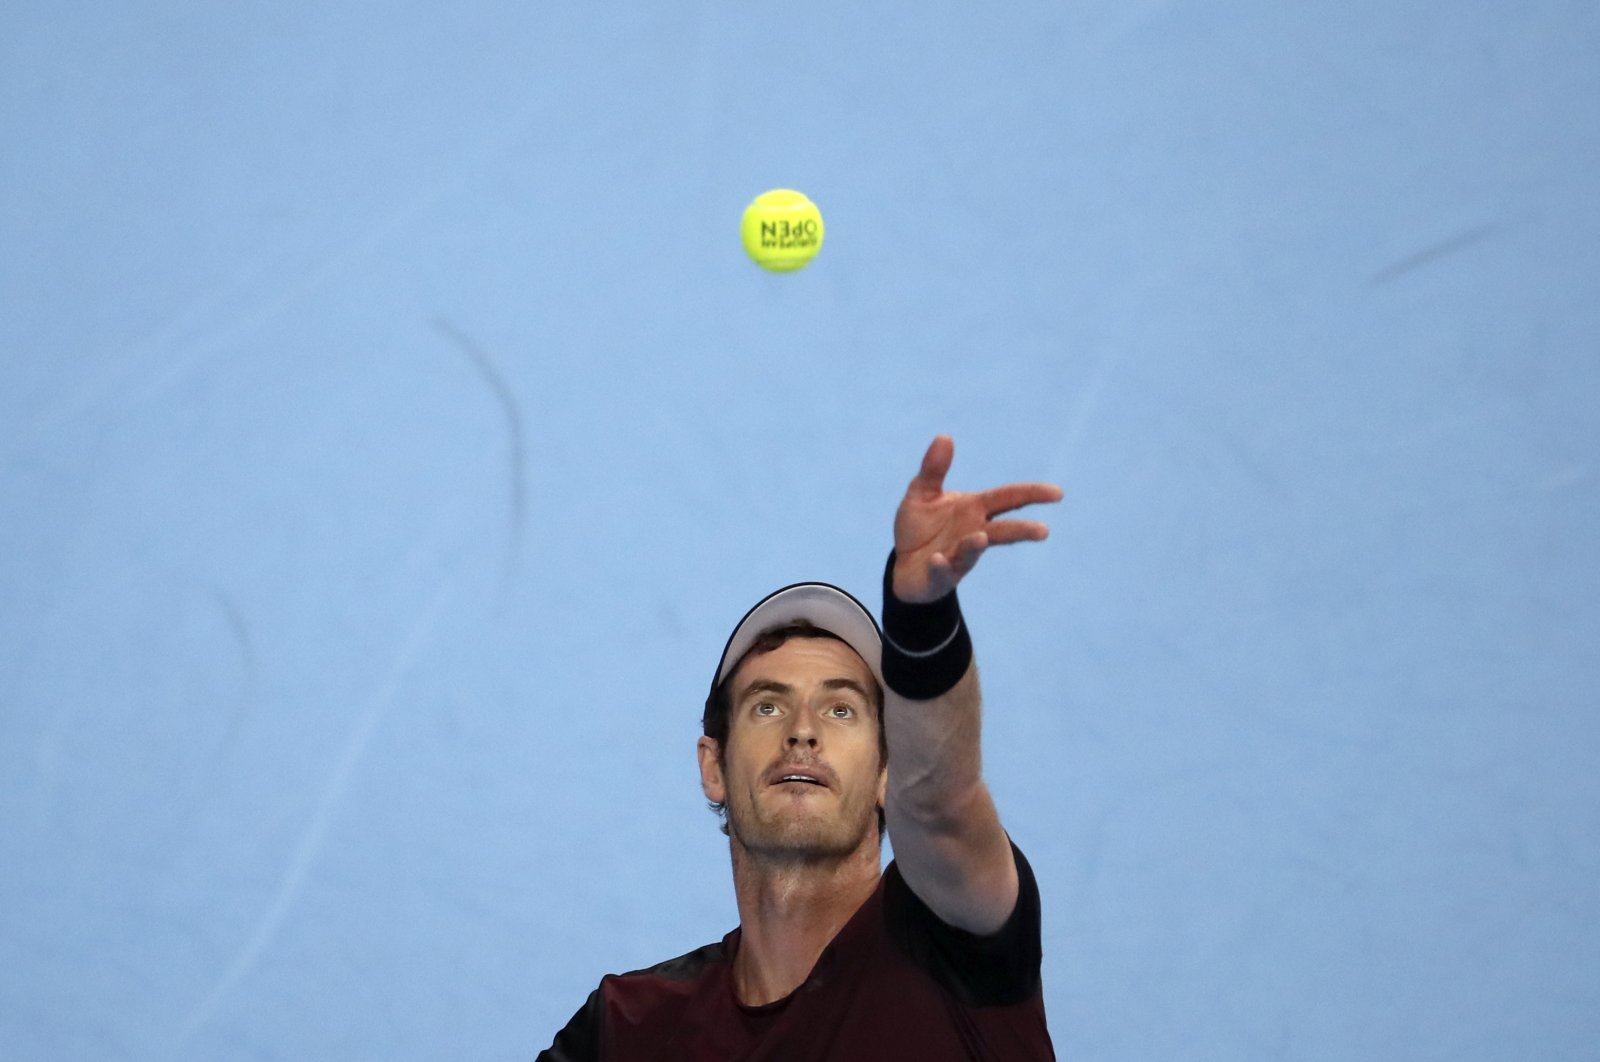 Andy Murray of Britain serves during the European Open final tennis match in Antwerp, Belgium, Oct. 20, 2019. (AP Photo)